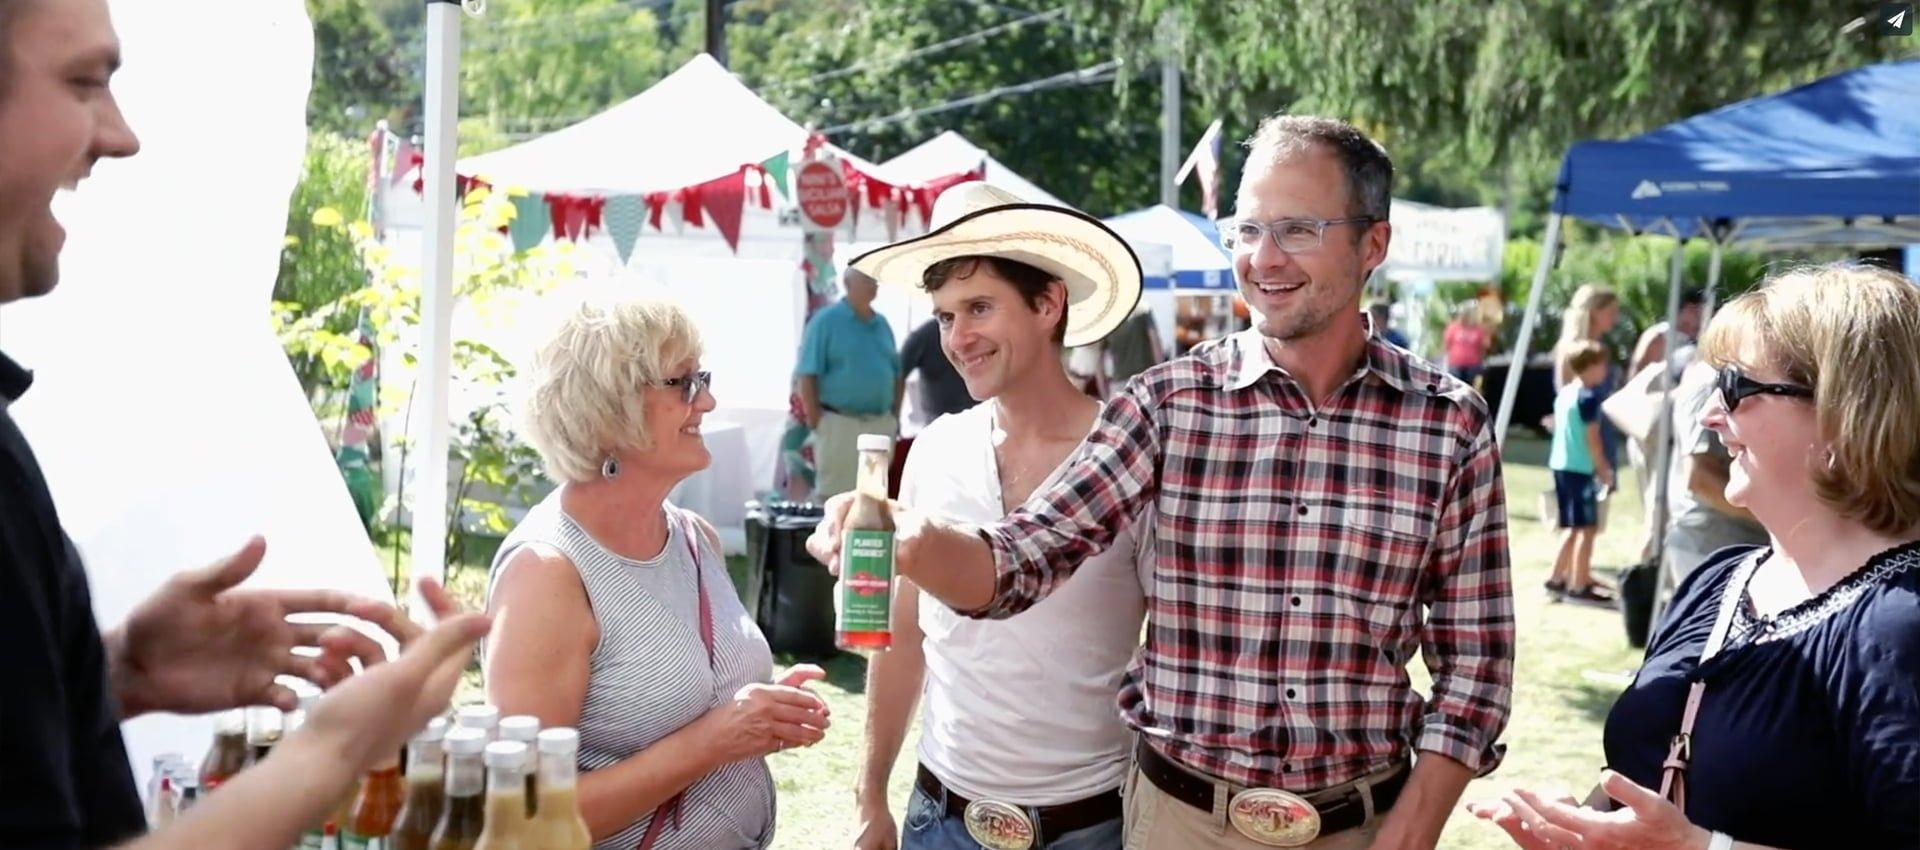 Beekman 1802's Harvest Festival